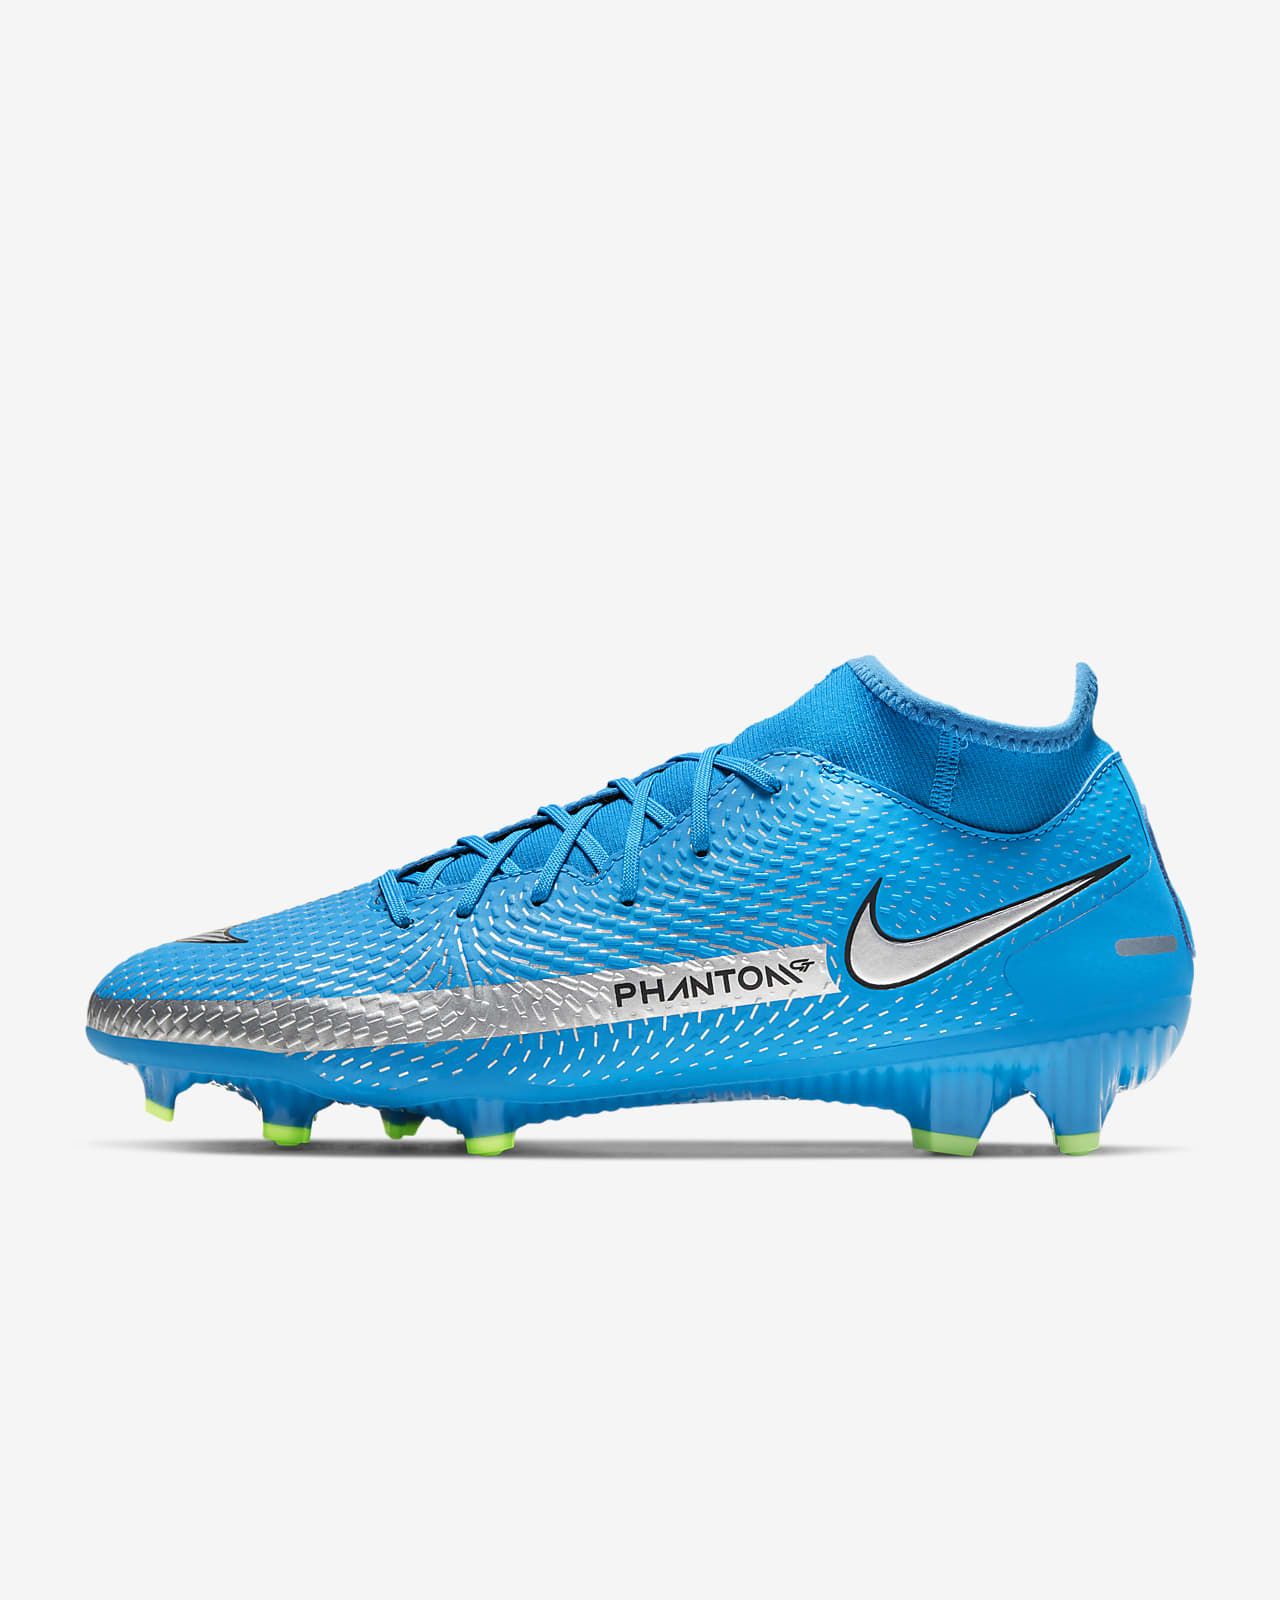 Calzado de fútbol para múltiples superficies Nike Phantom GT Academy Dynamic Fit MG